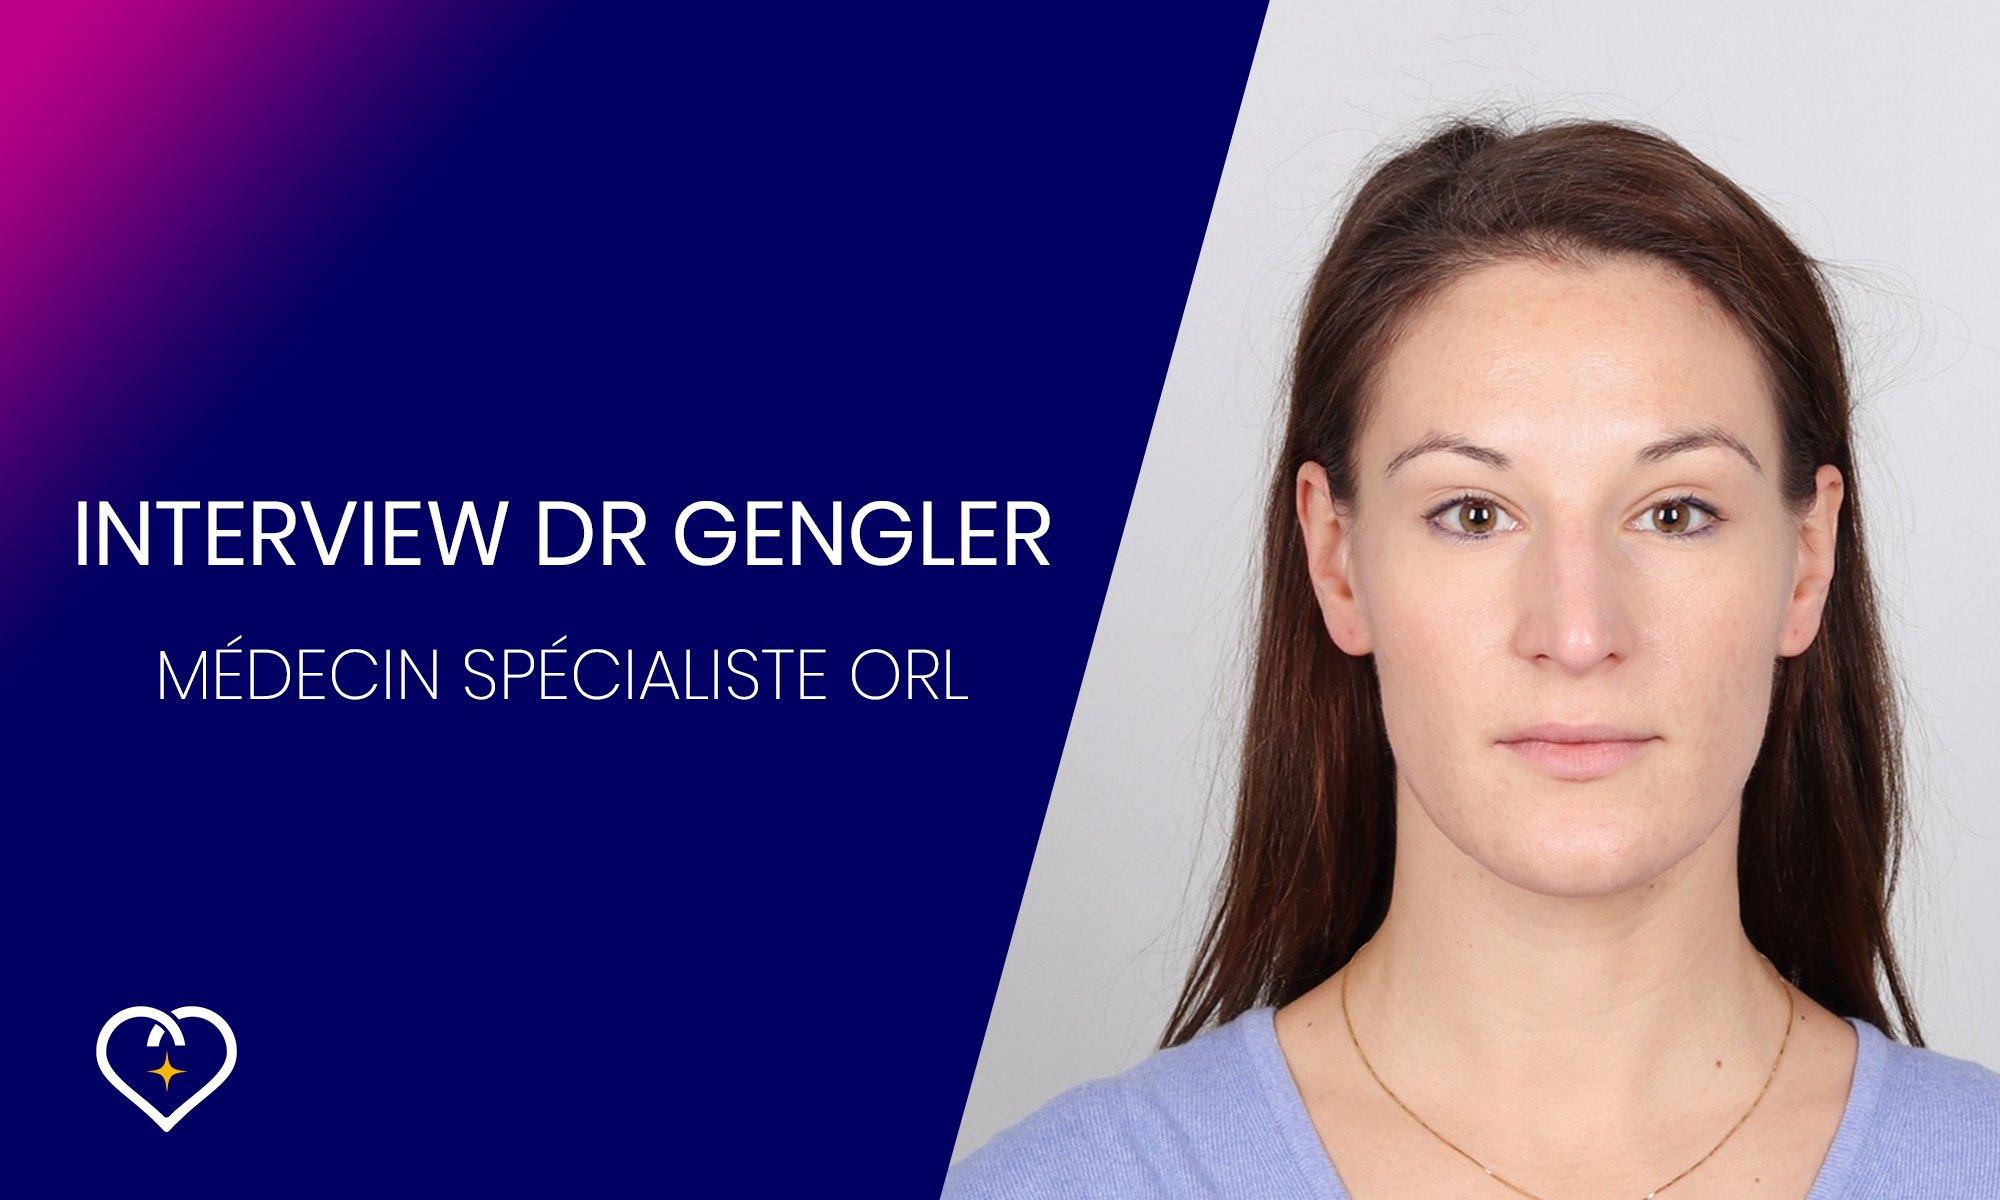 Interview DR Gengler - Concilio